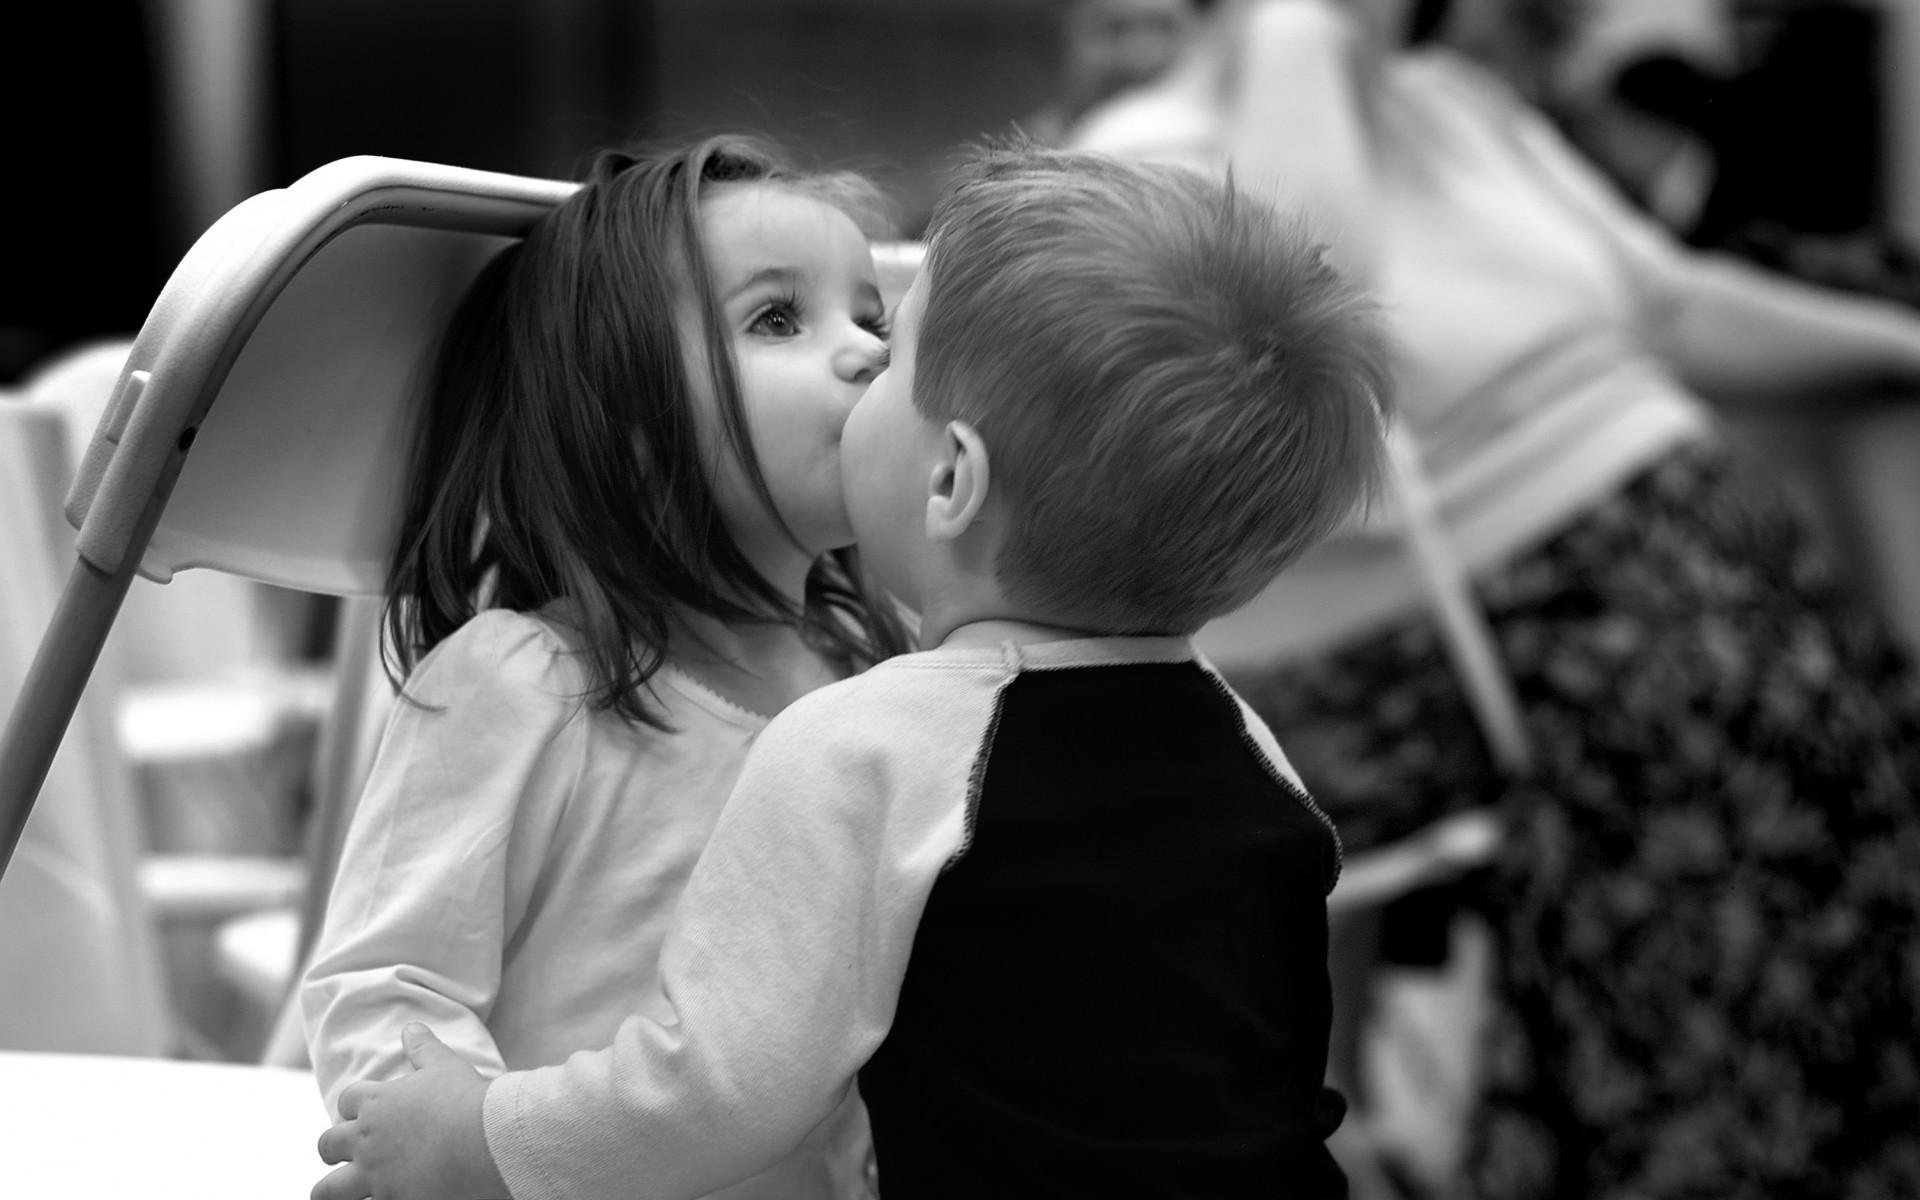 Cute Kids Love Hug HD Wallpaper   Stylish HD Wallpapers 1920x1200